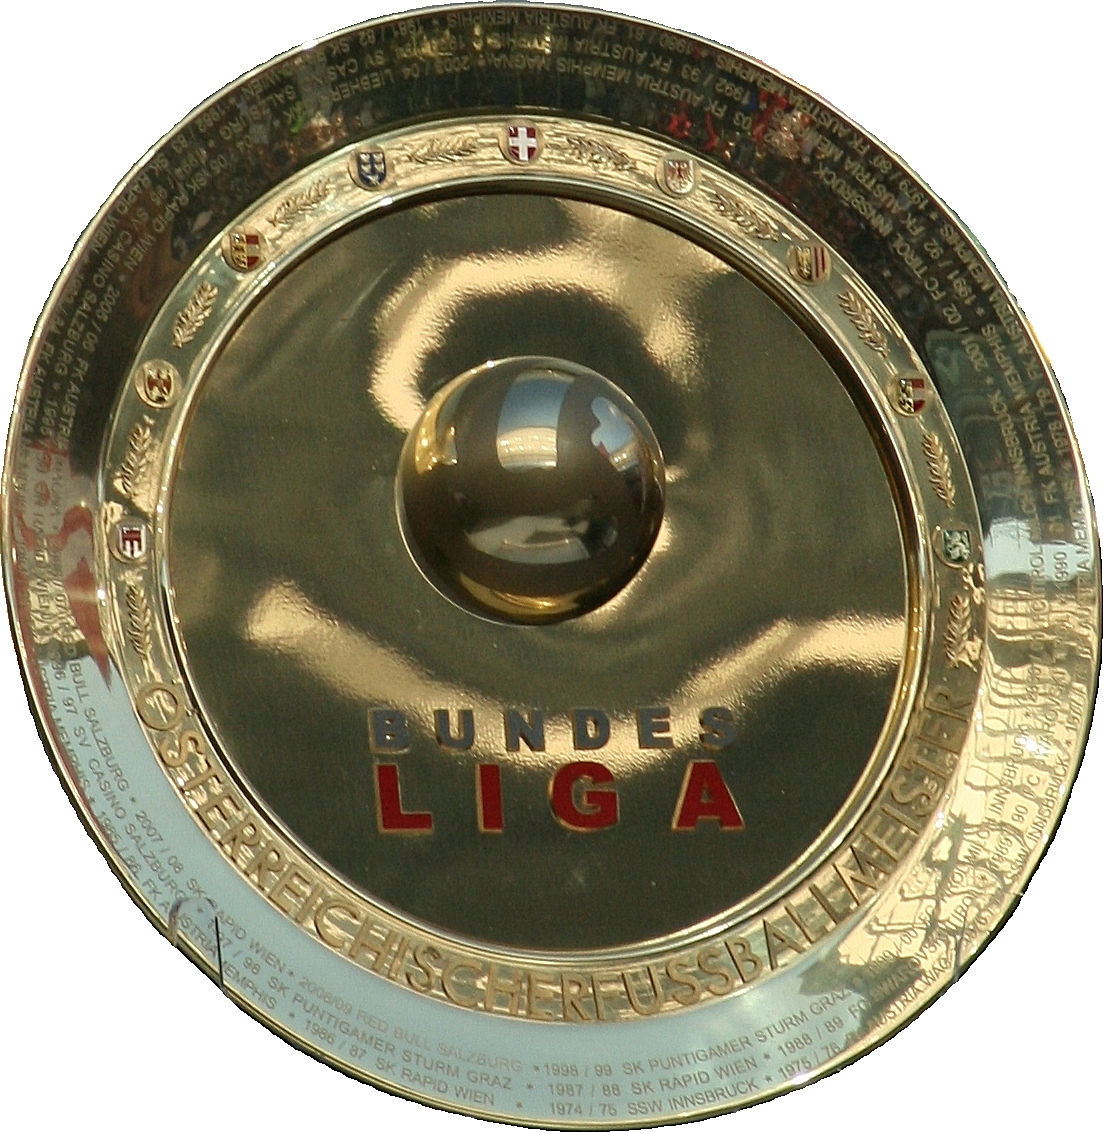 Fu ball bundesliga austria wikipedia for Bundesliga tabelle